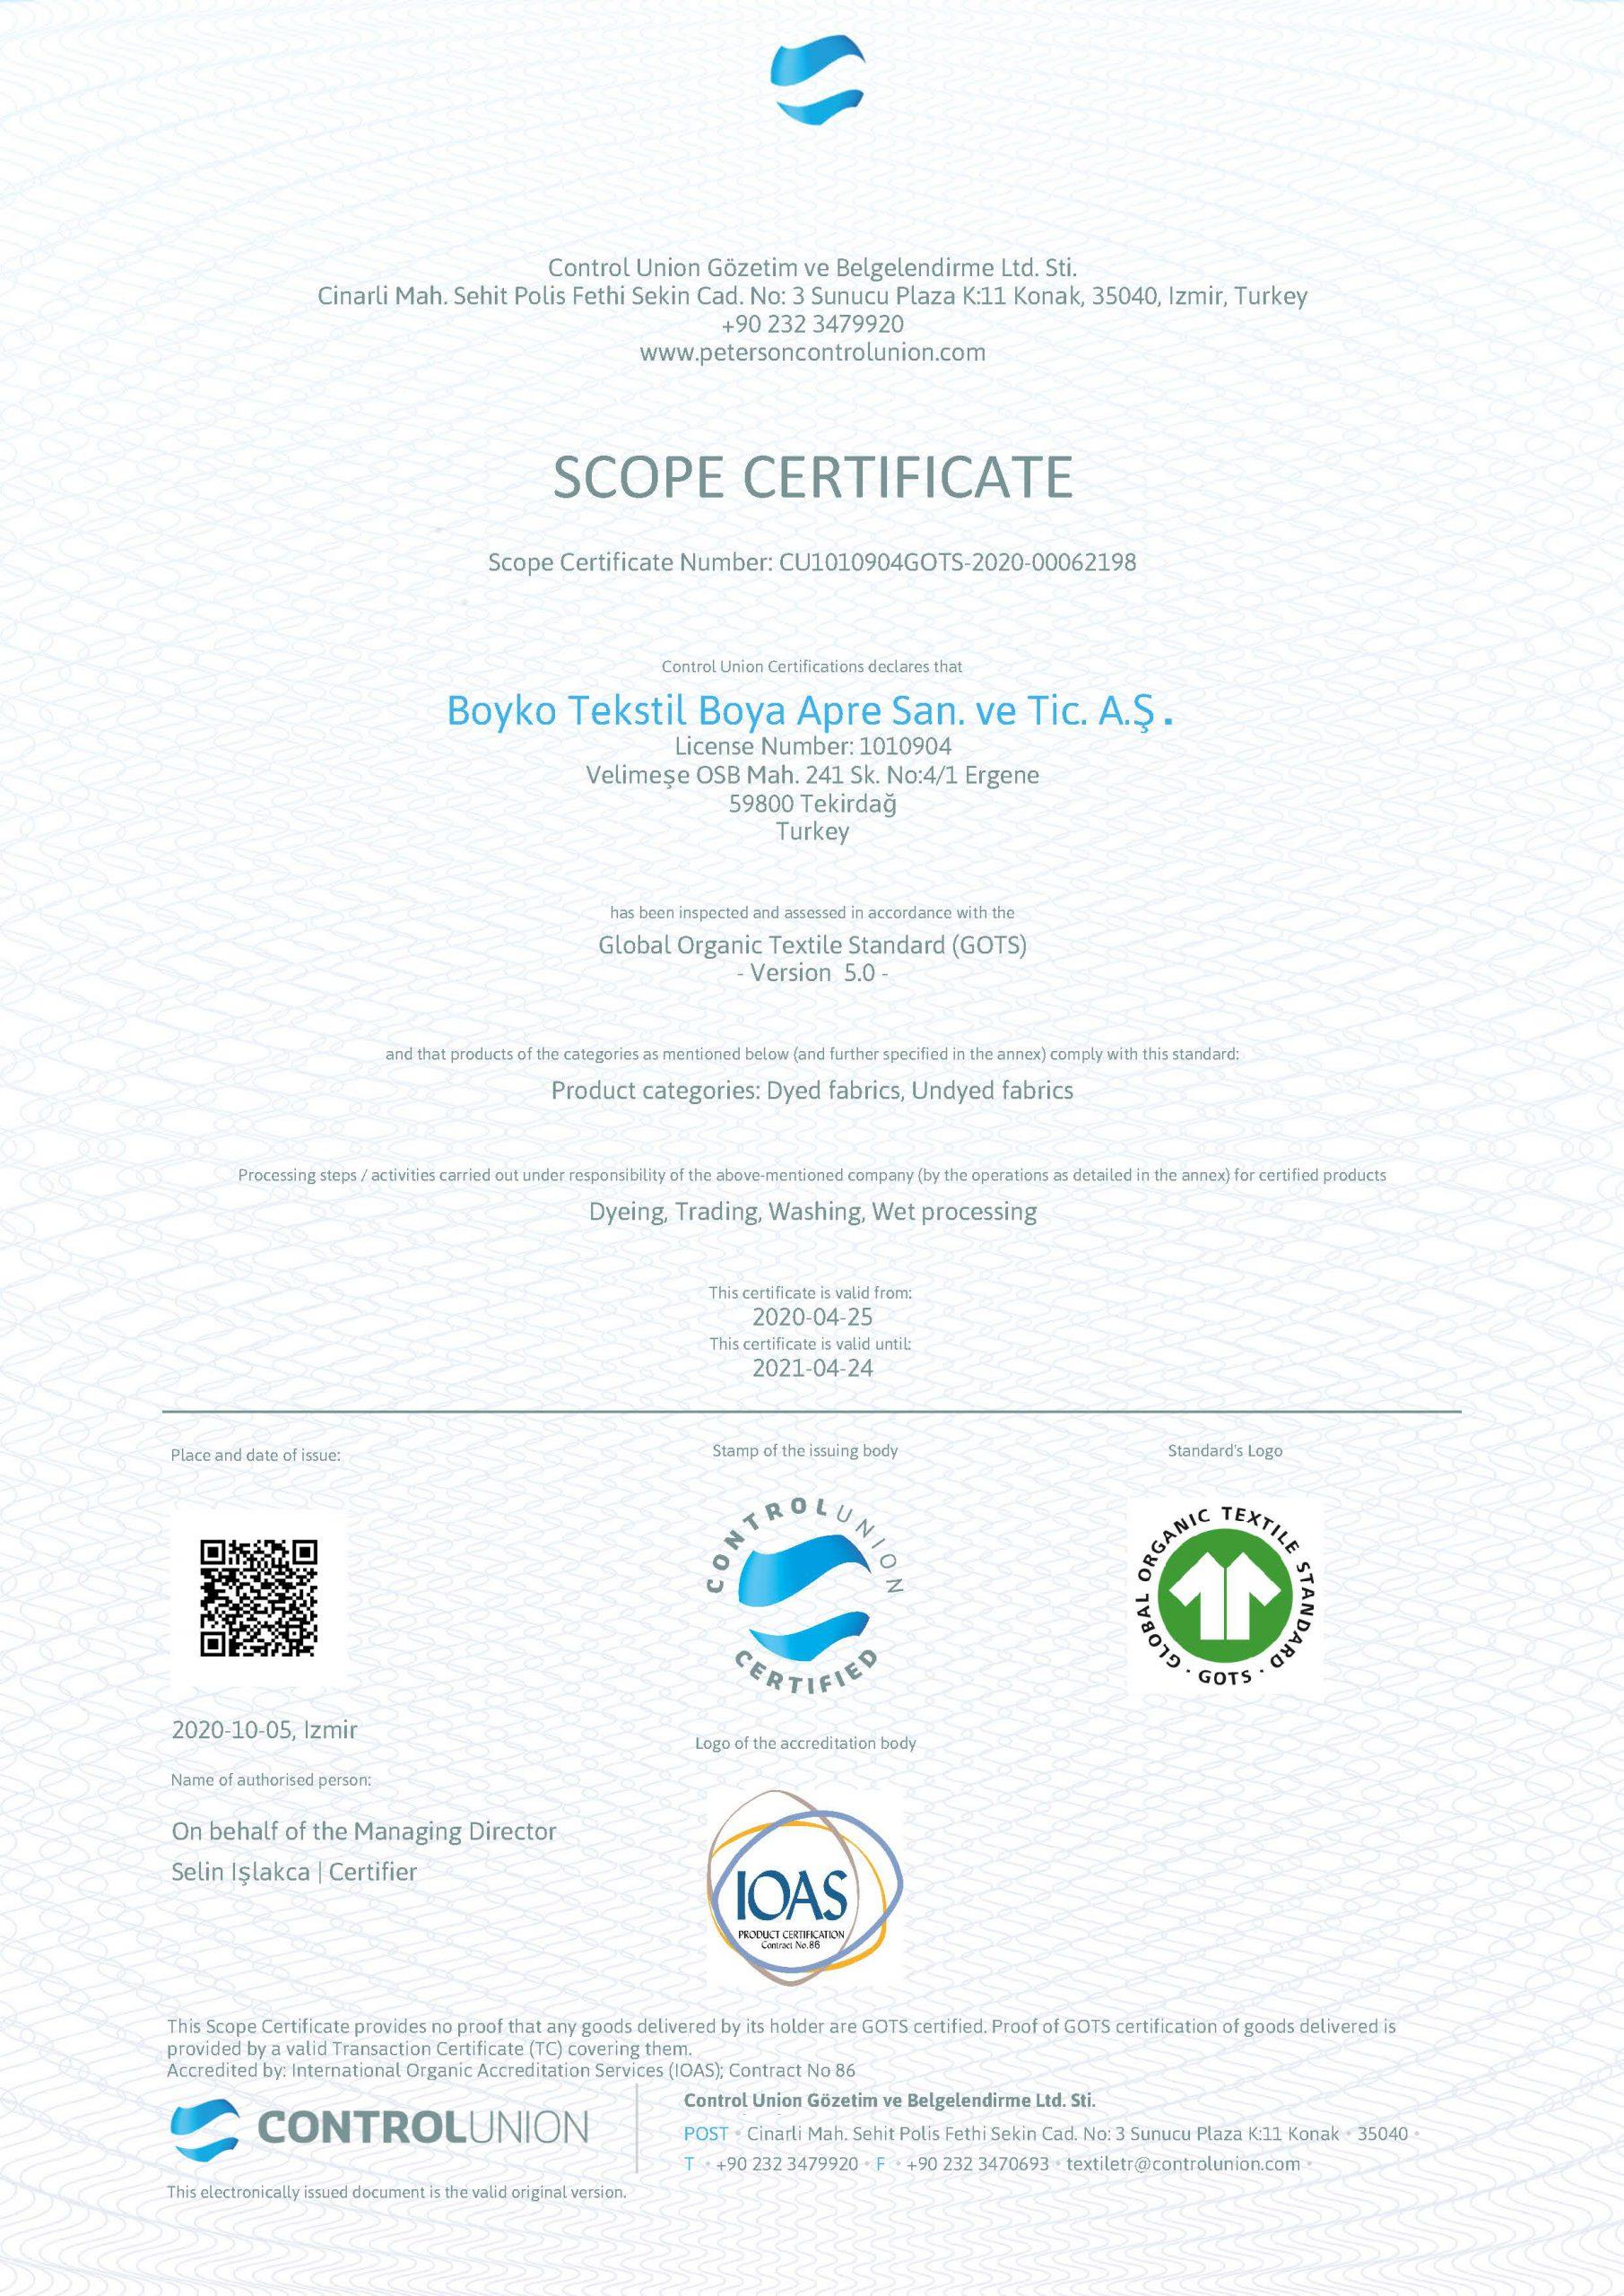 GOTS_Scope_Certificate_2020-10-05 16_56_56 UTC_Page_1